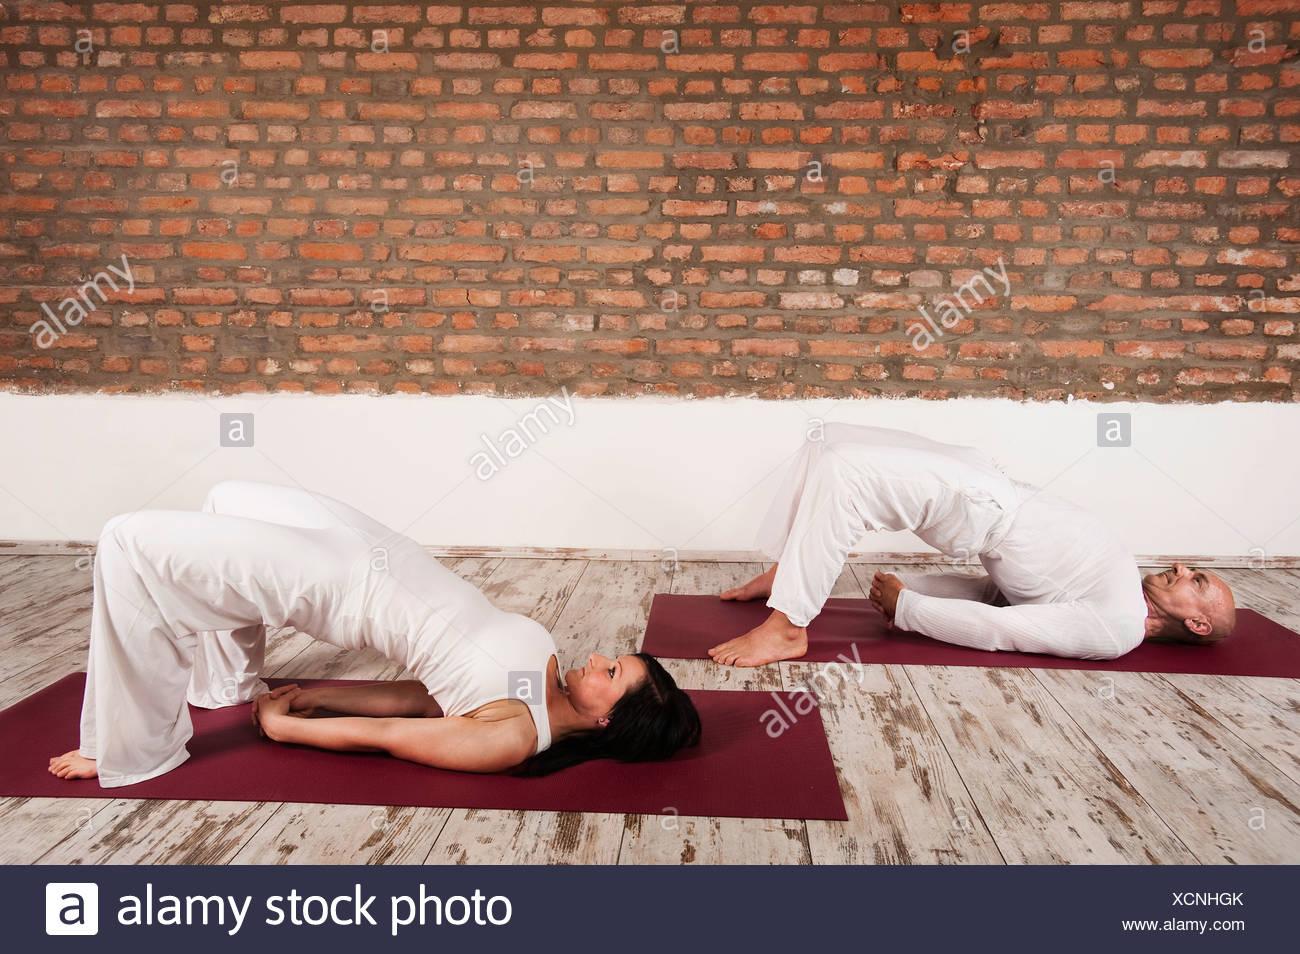 Couple Practising Yoga, Bridge Pose - Stock Image